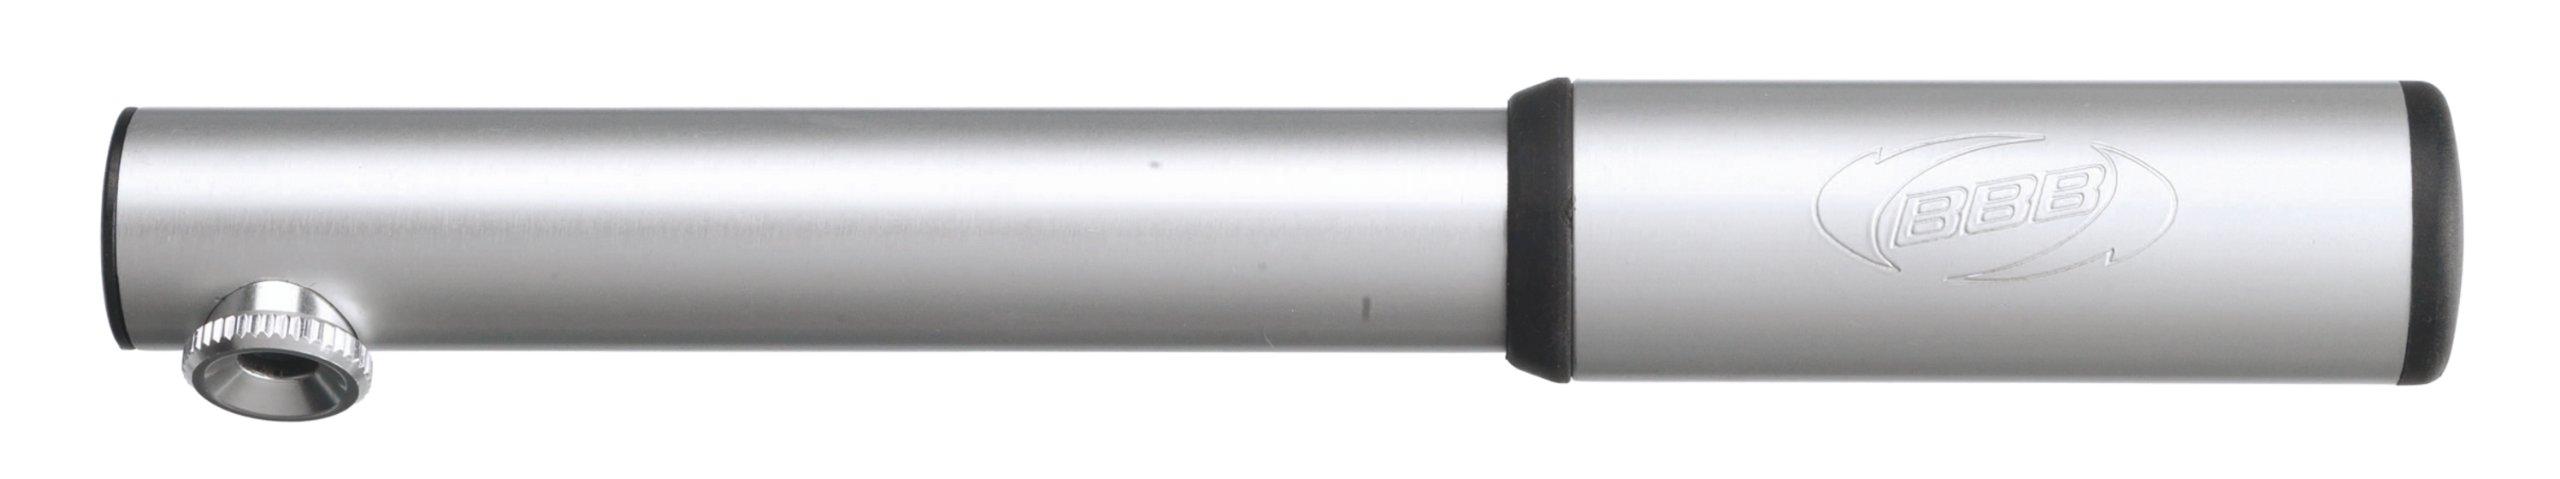 BBB CompactRoad Mini Road Bike Pump BMP-40 Silver